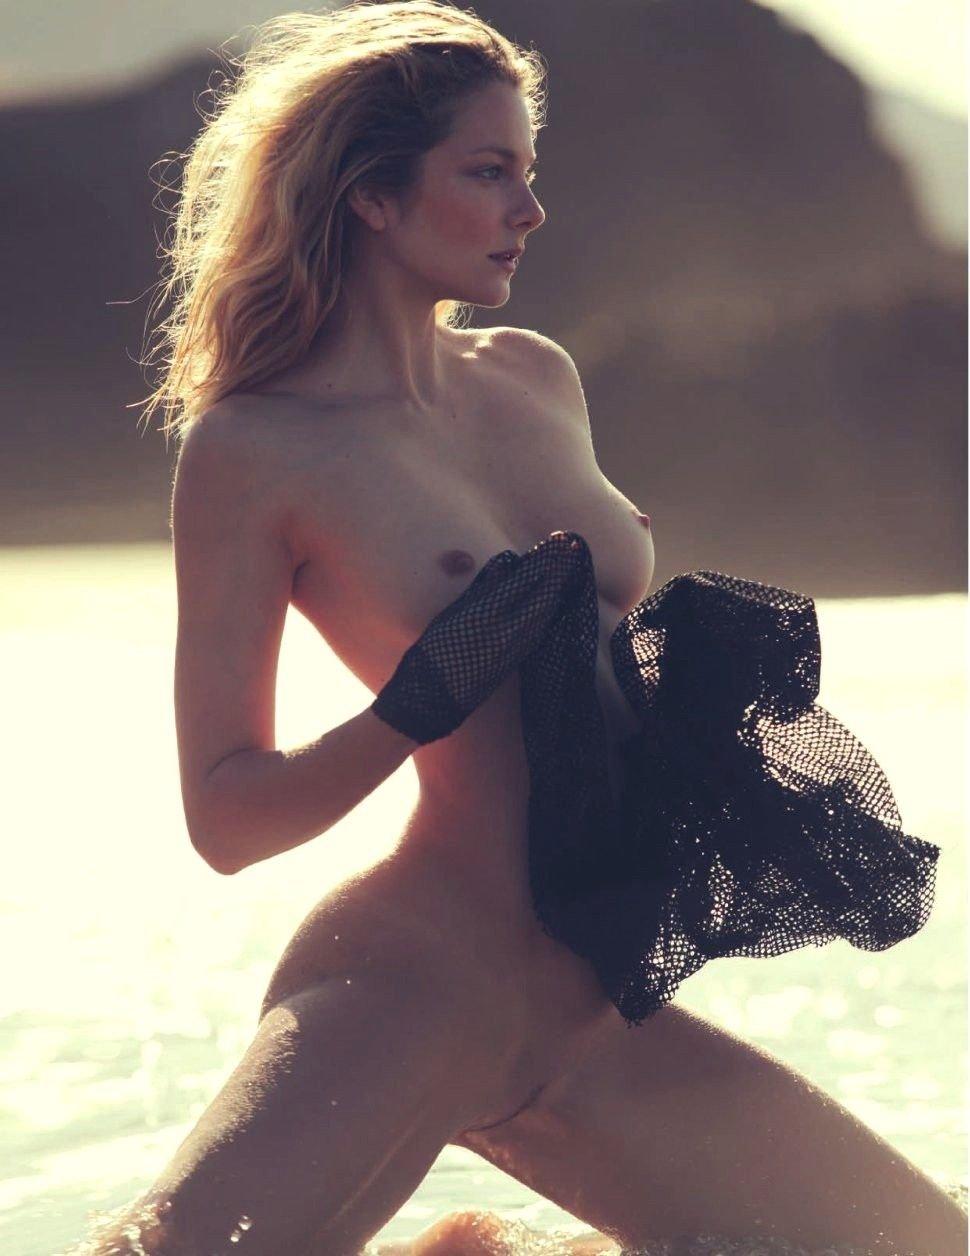 Eniko mihalik topless in vogue france nov 2009 by cedric buchet hq scans new foto